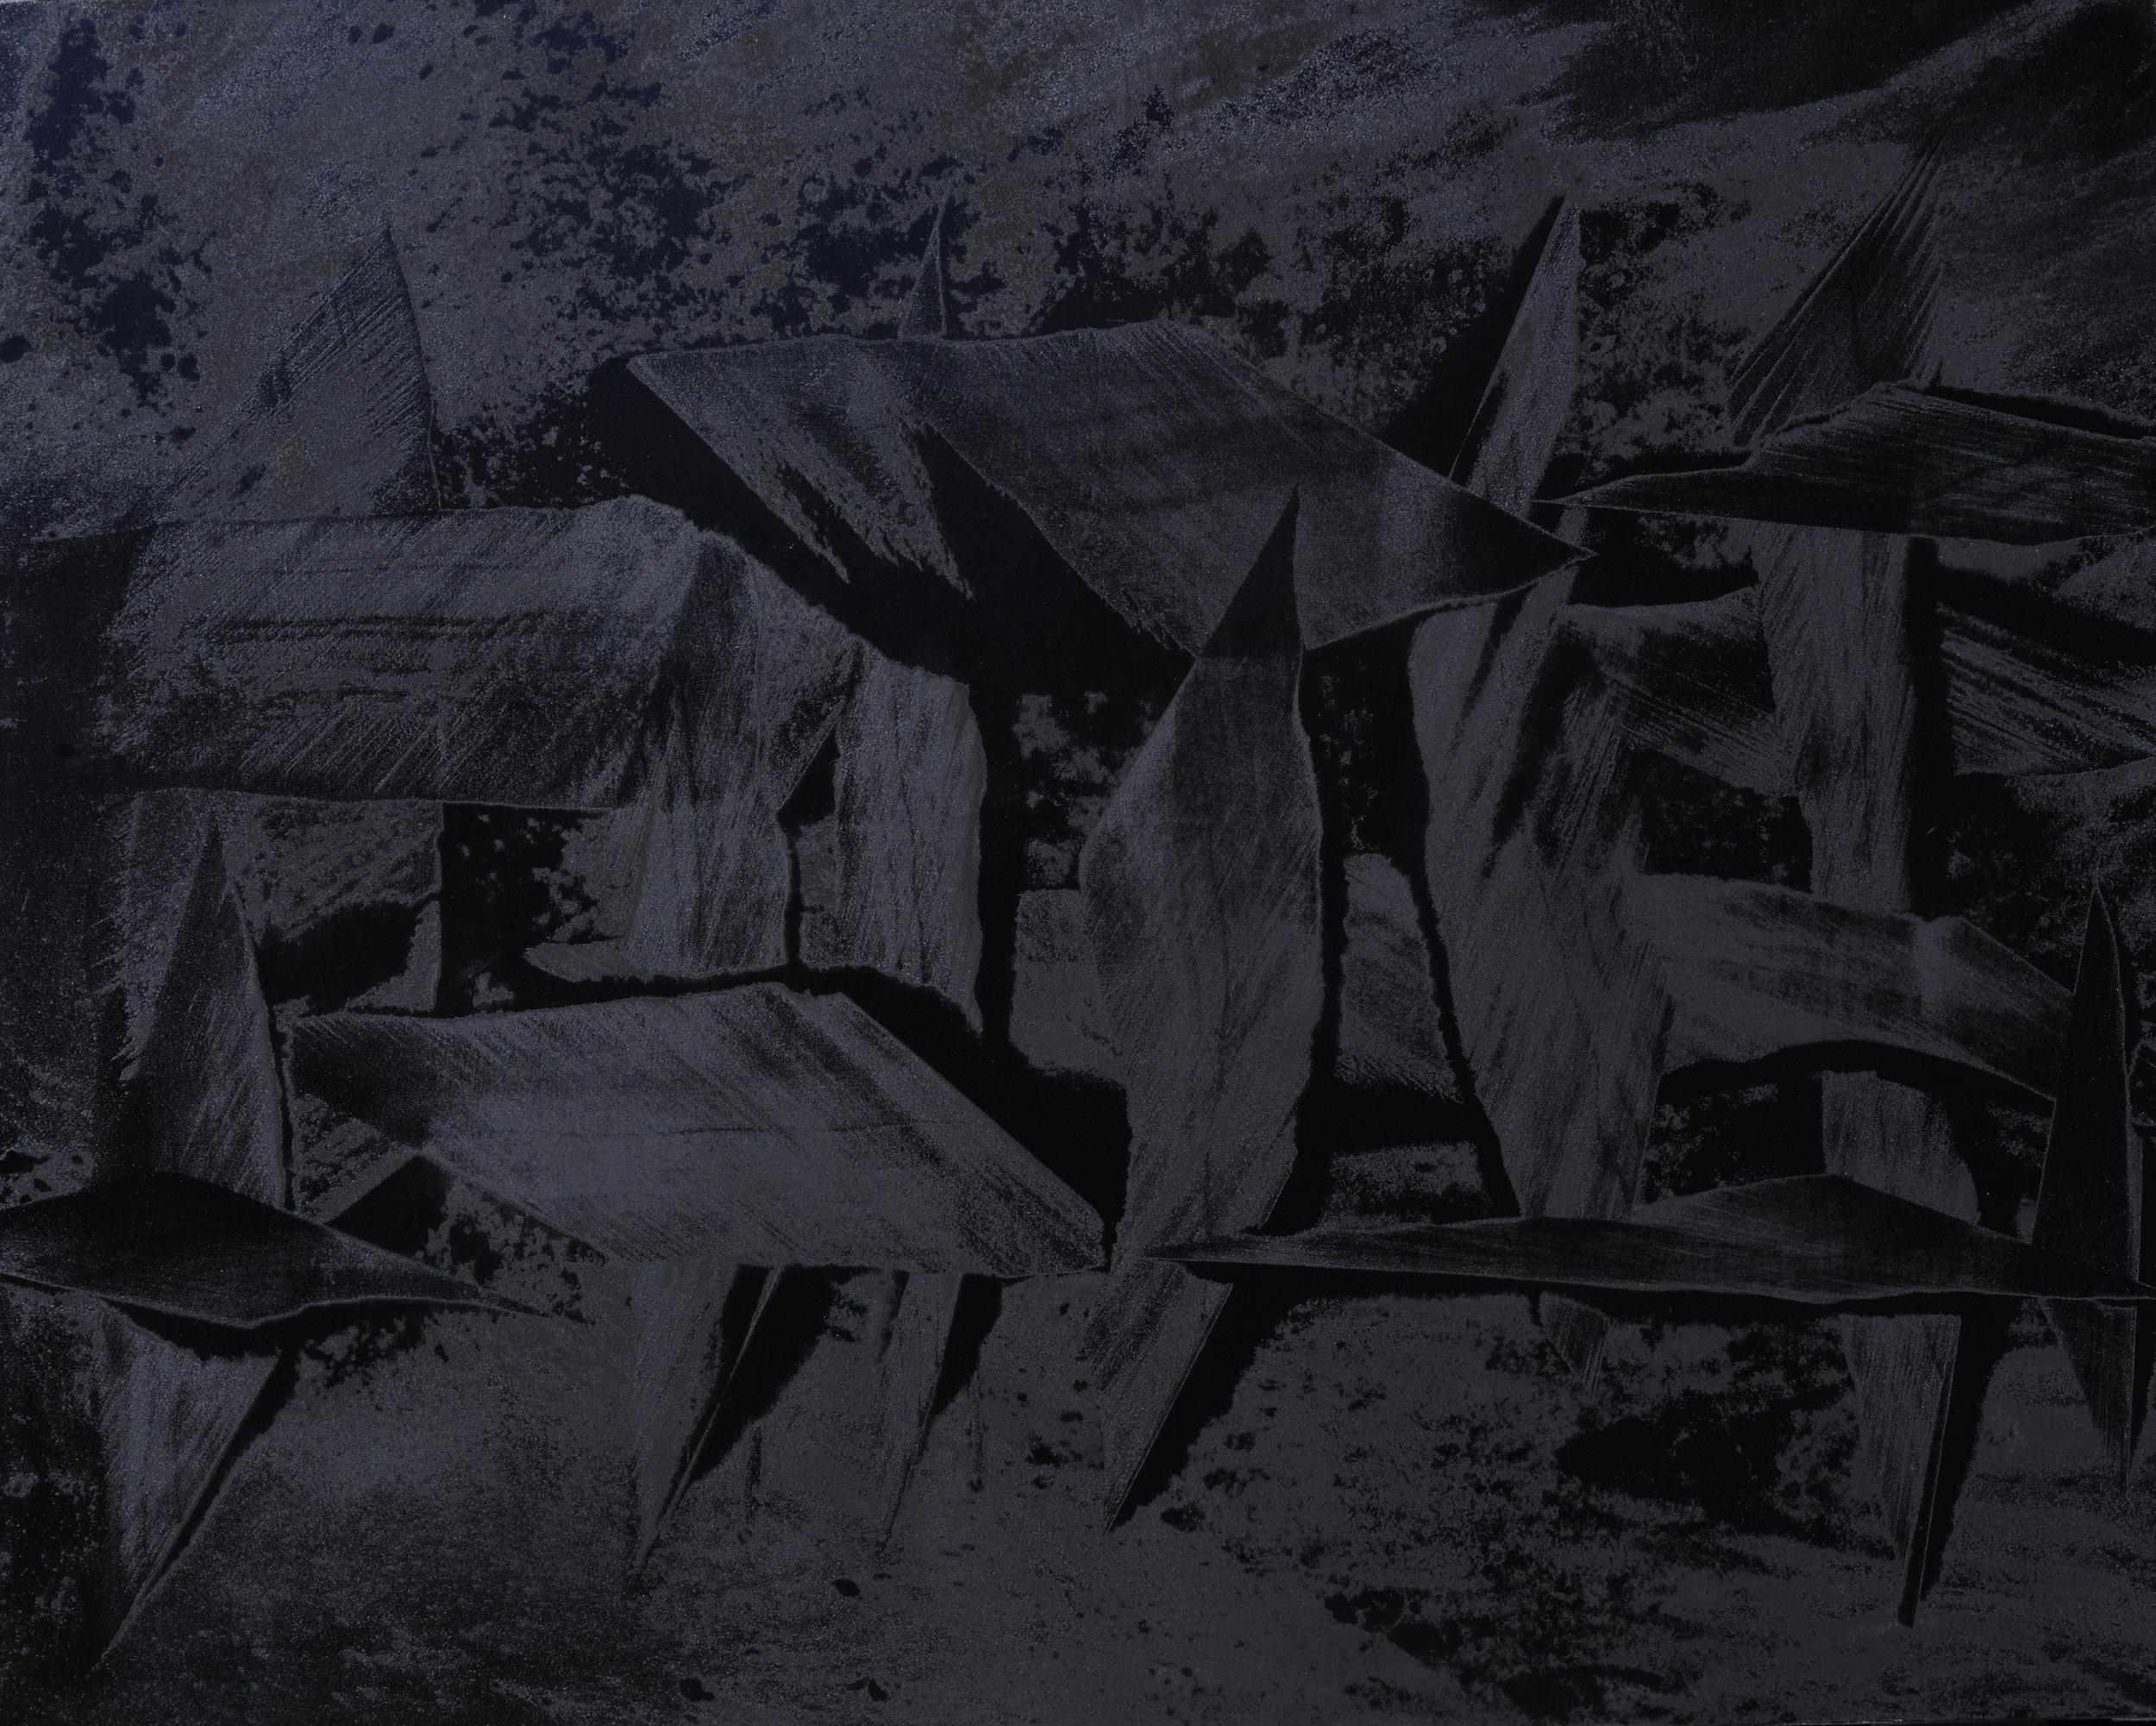 Black Void No. 11, 162cm x 130cm 100F, Oil on Canvas.jpg